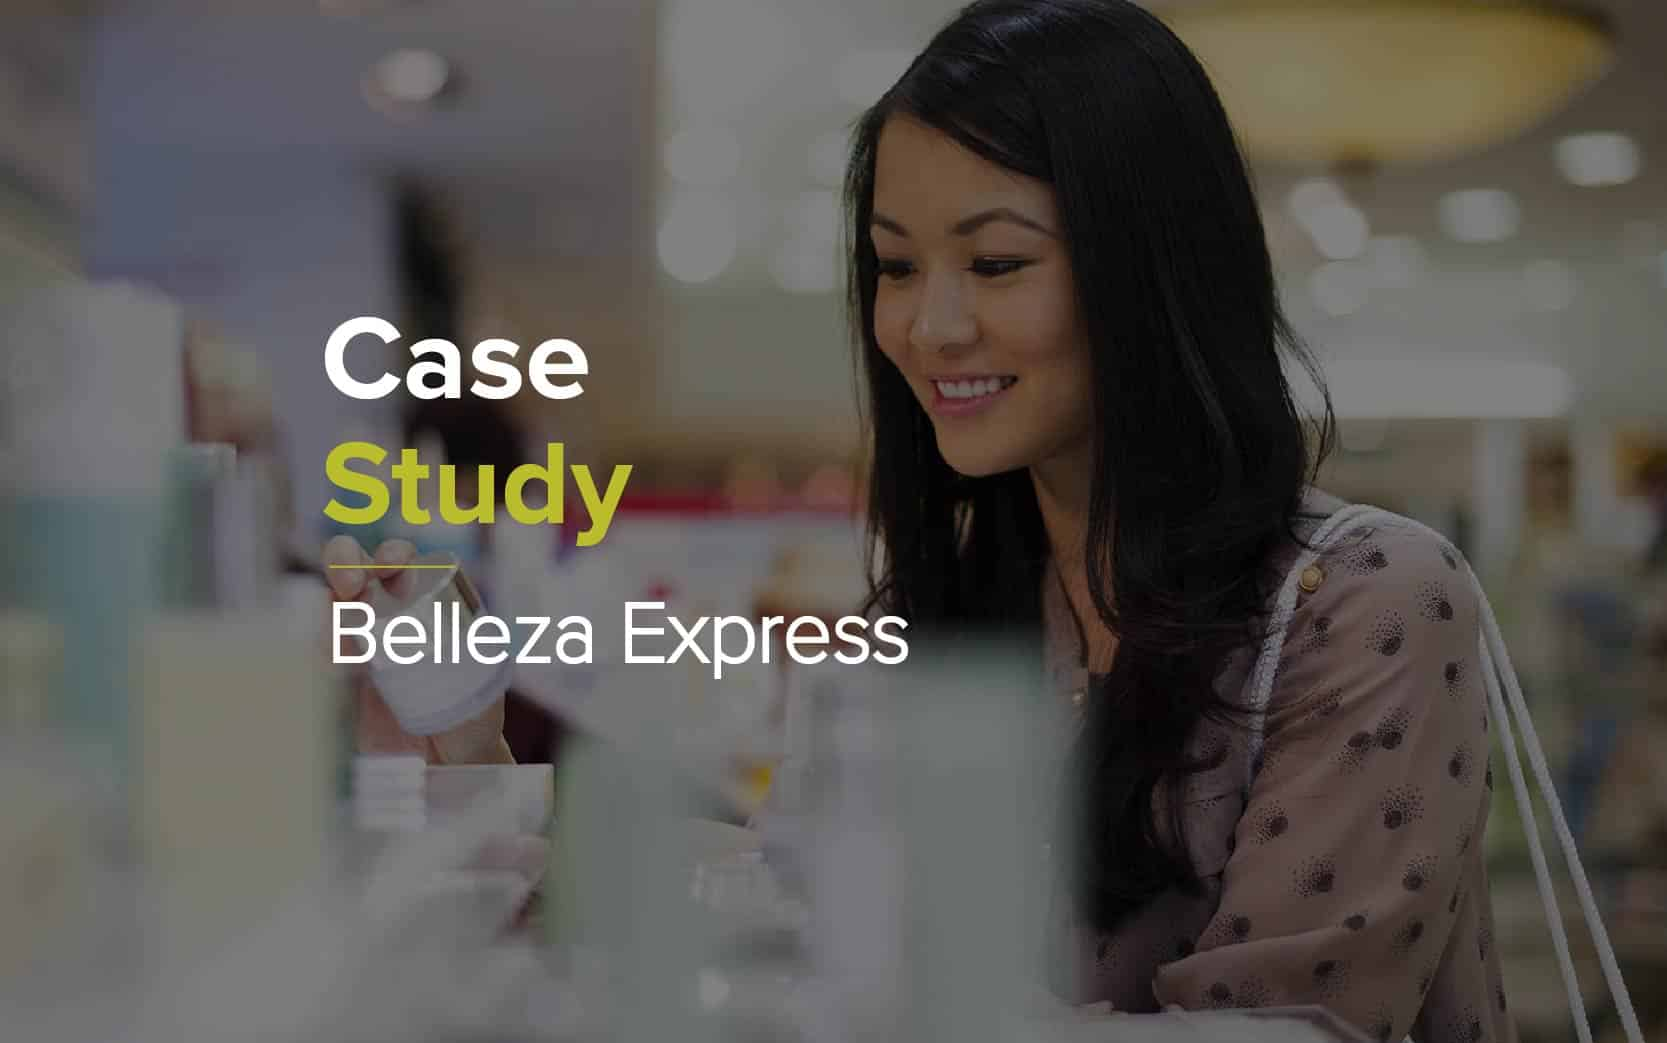 Case Study: Belleza Express